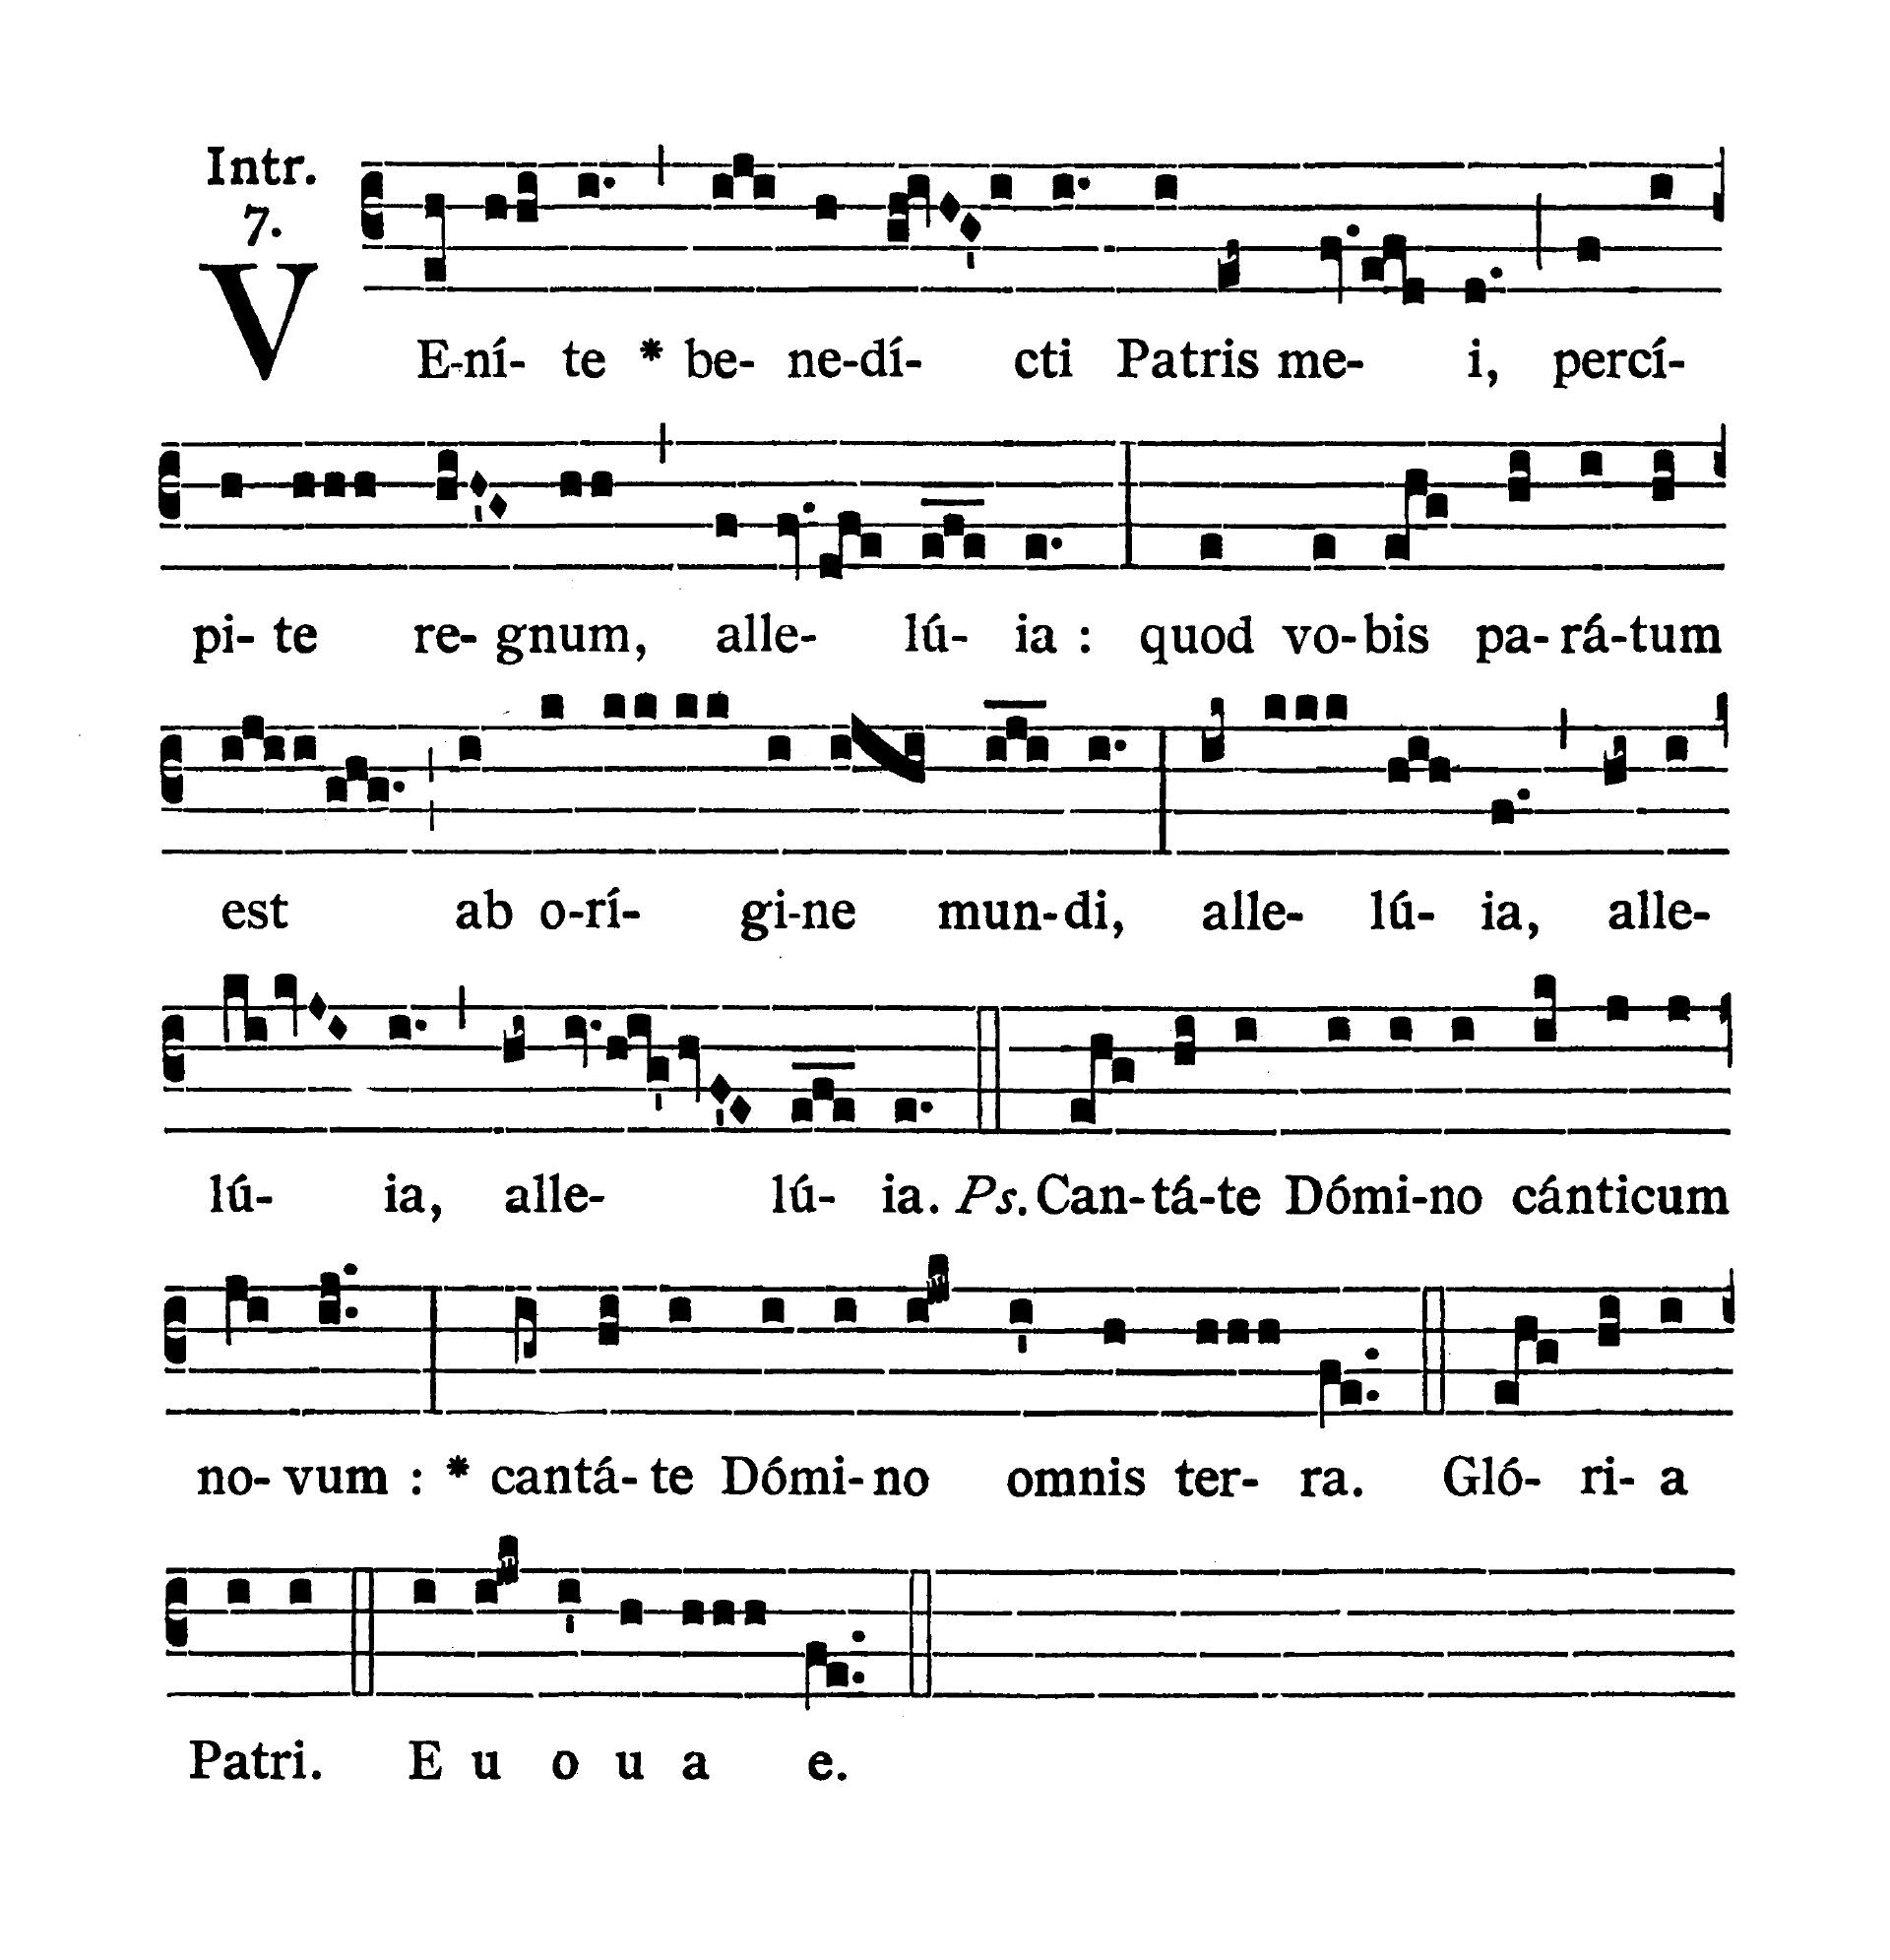 Feria quarta post Pascha (Środa Wielkanocna) - Introitus (Venite benedicti)